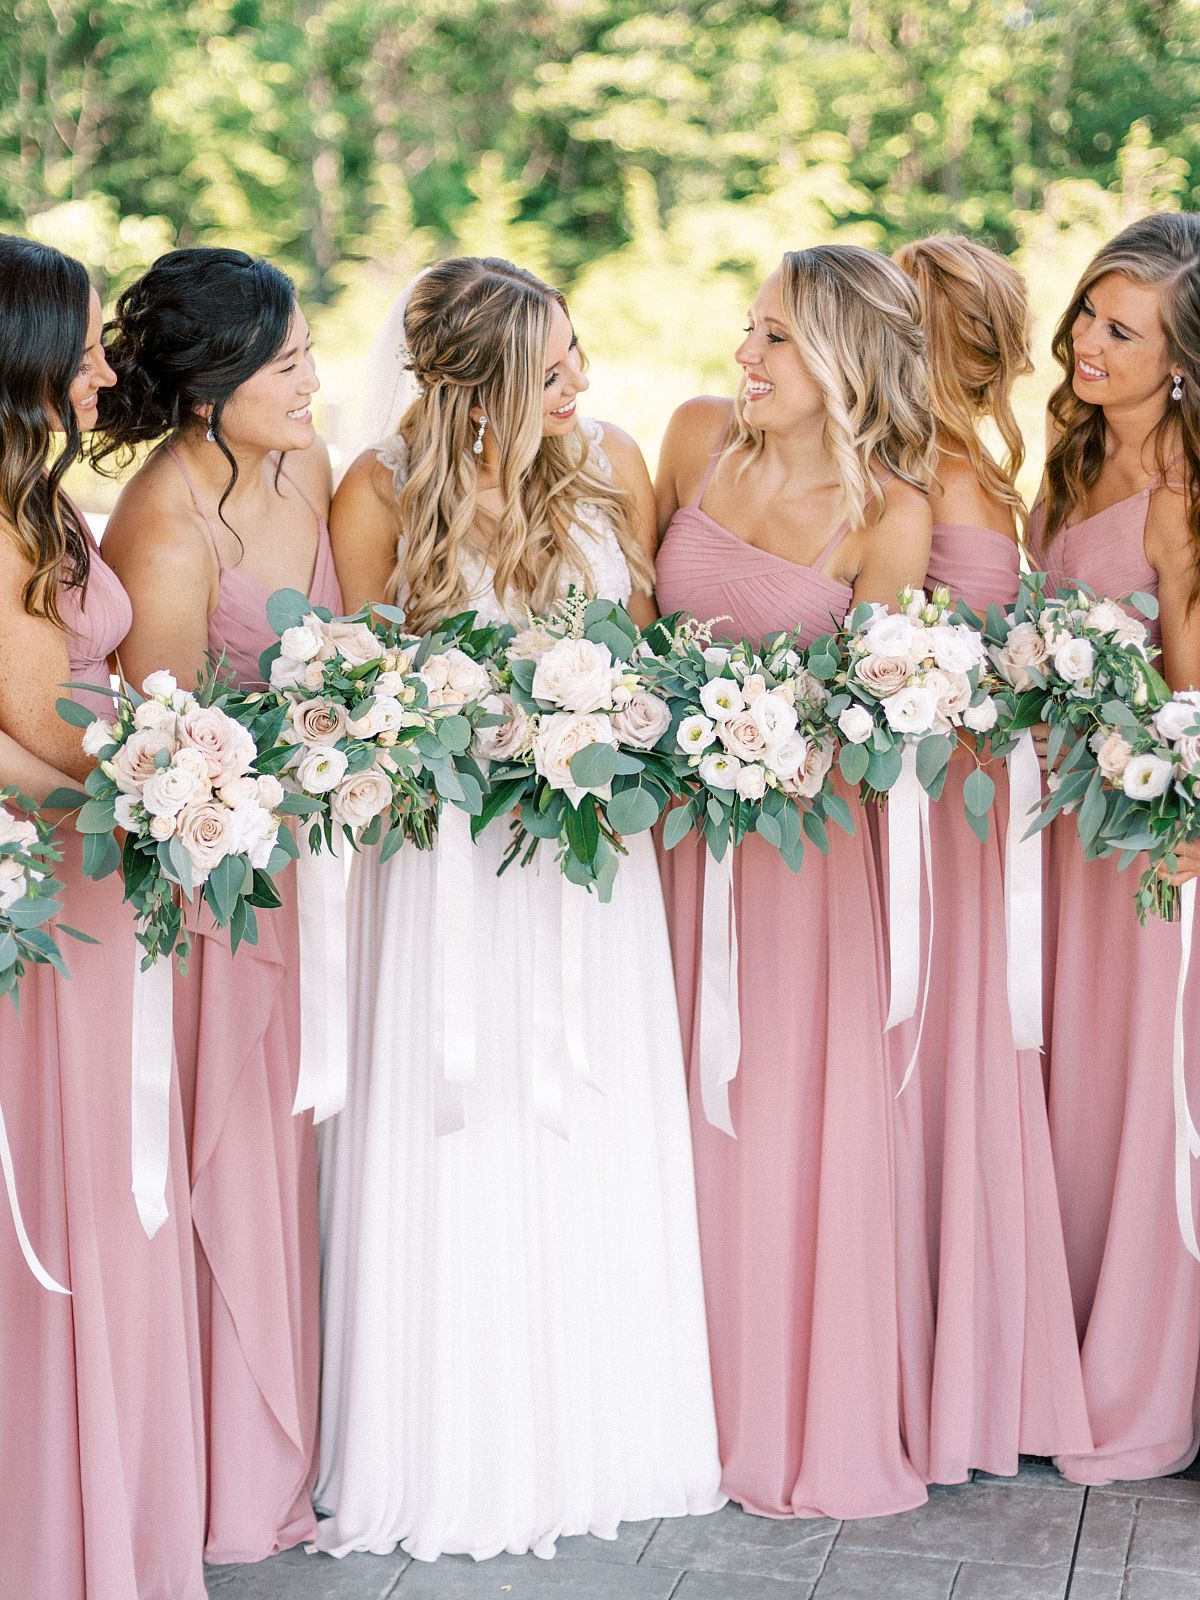 24 Best Bridesmaids Dresses For The Fine Art Bride In 2020 Blush Colored Bridesmaid Dresses Blush Bridesmaid Dresses Summer Blush Pink Bridesmaid Dresses